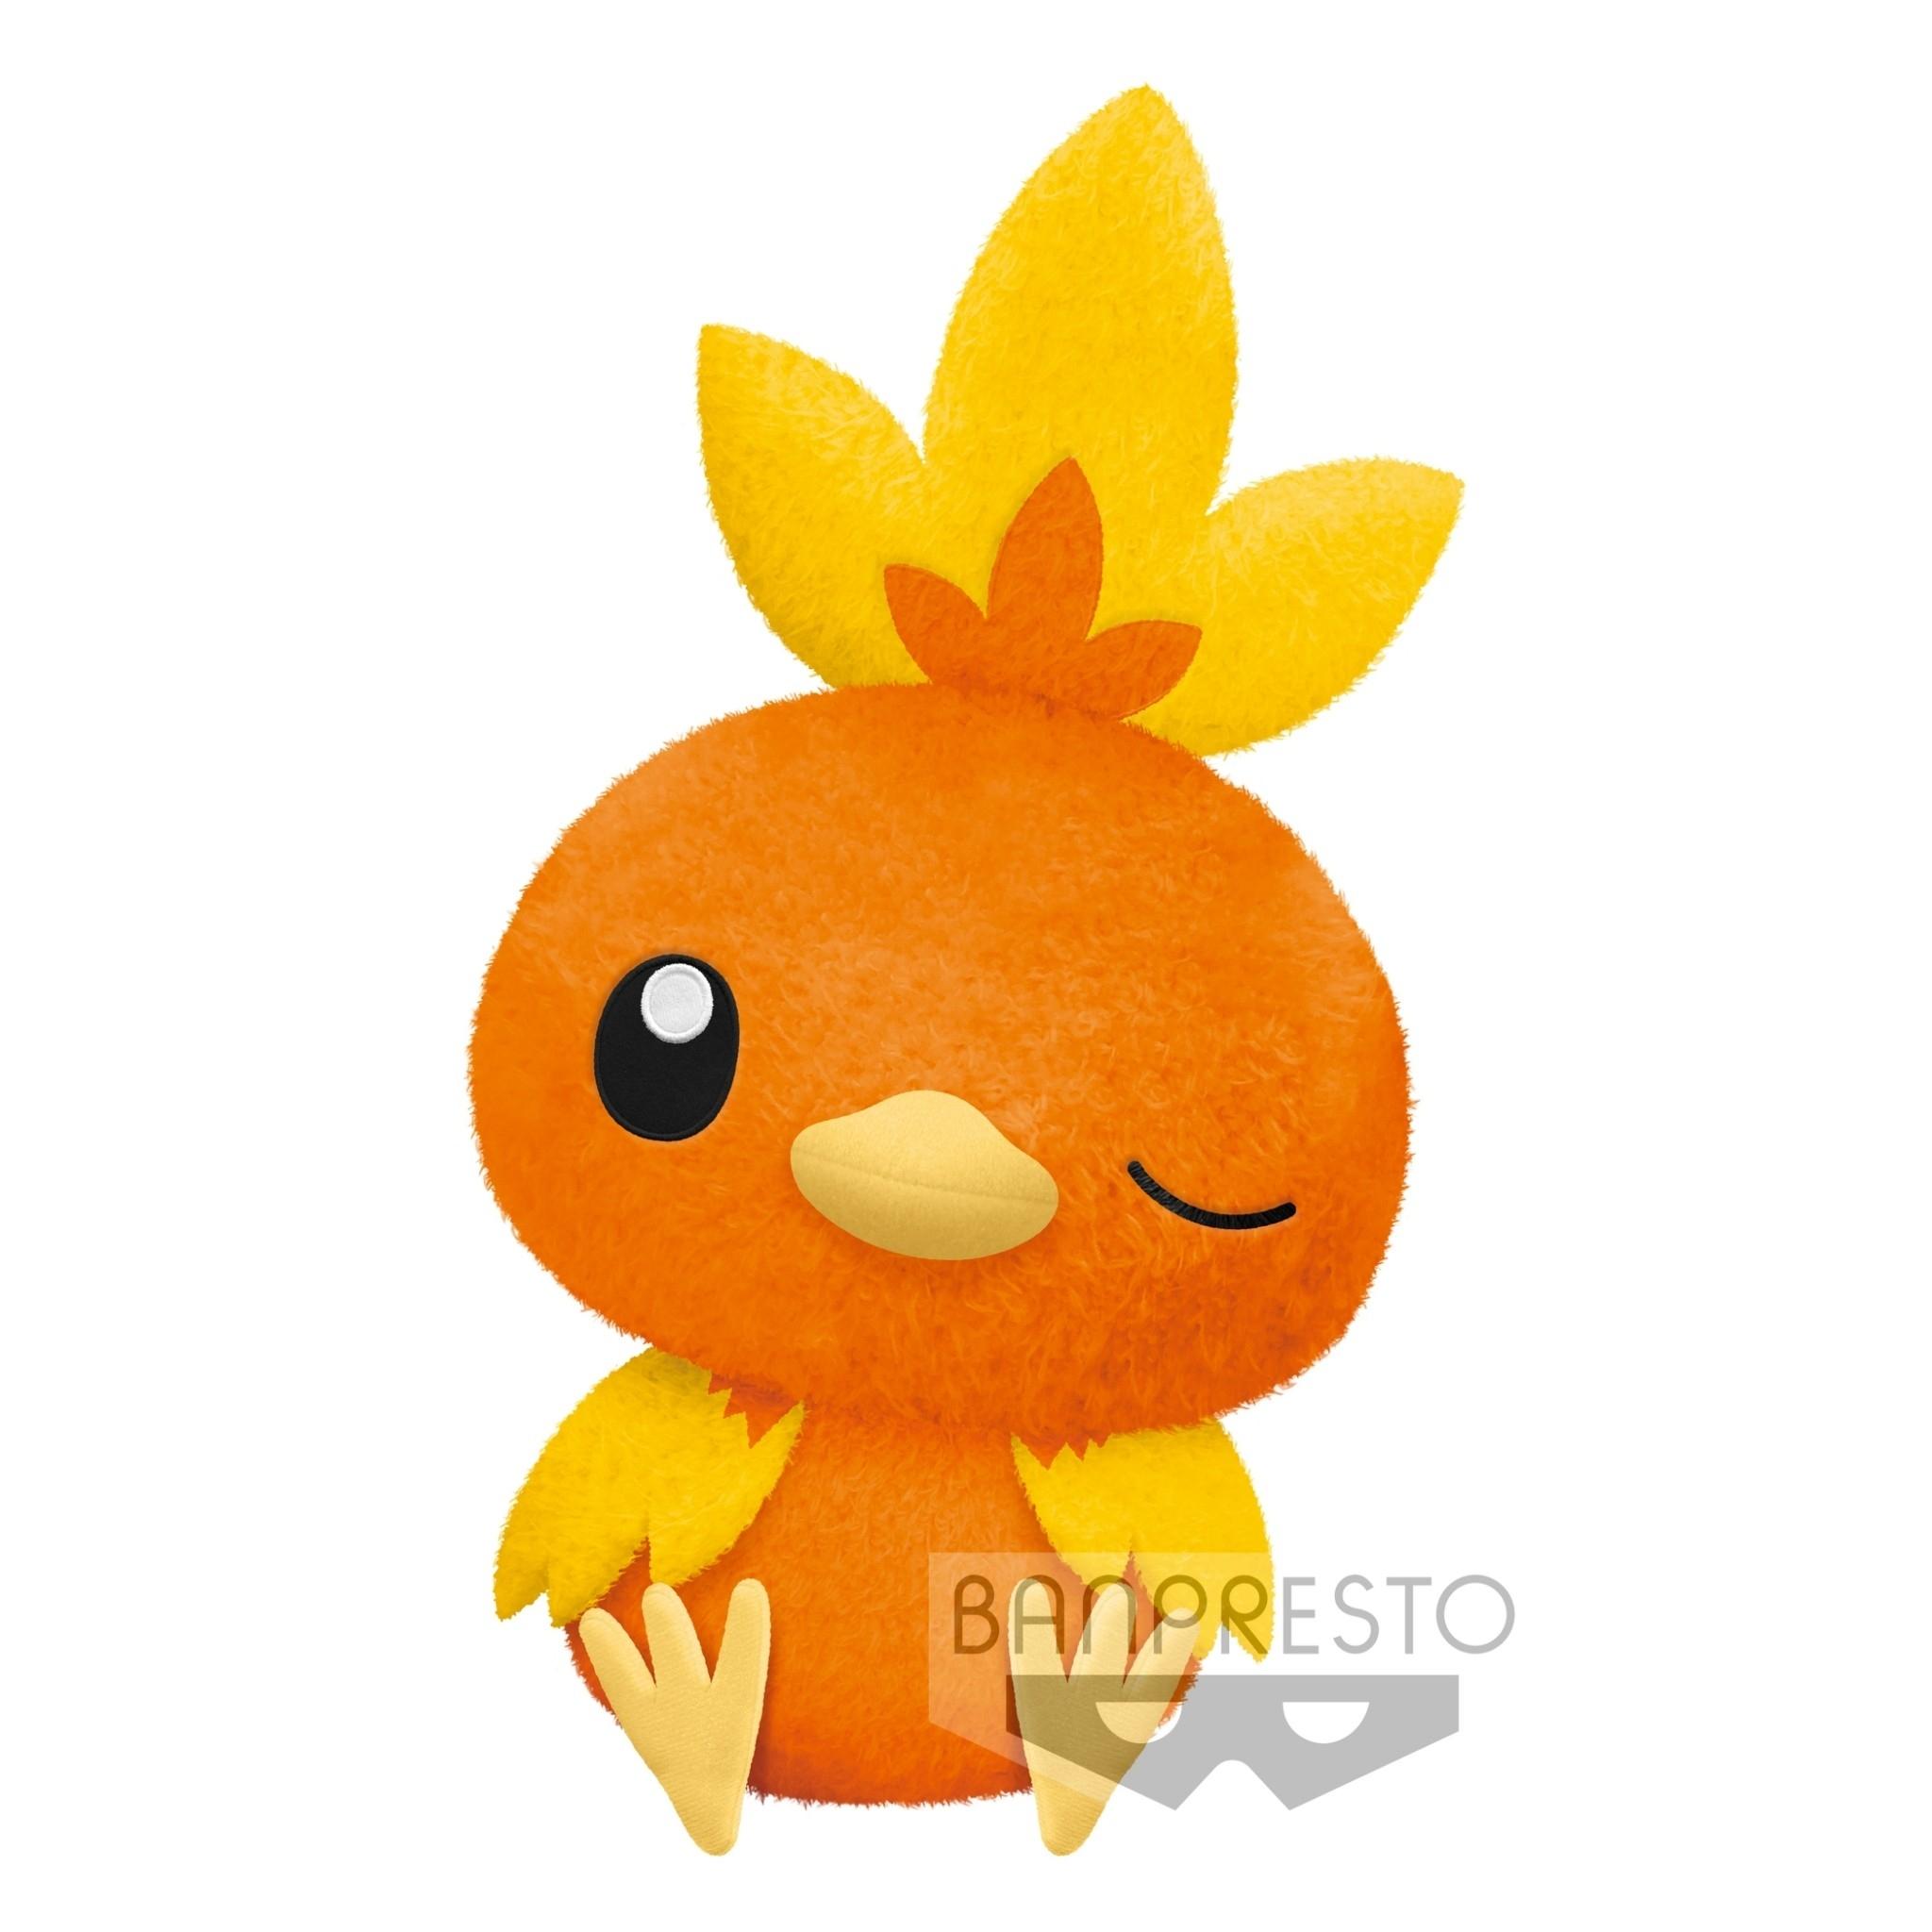 BANPRESTO|精靈寶可夢 休息時間超大絨毛玩偶 火稚雞